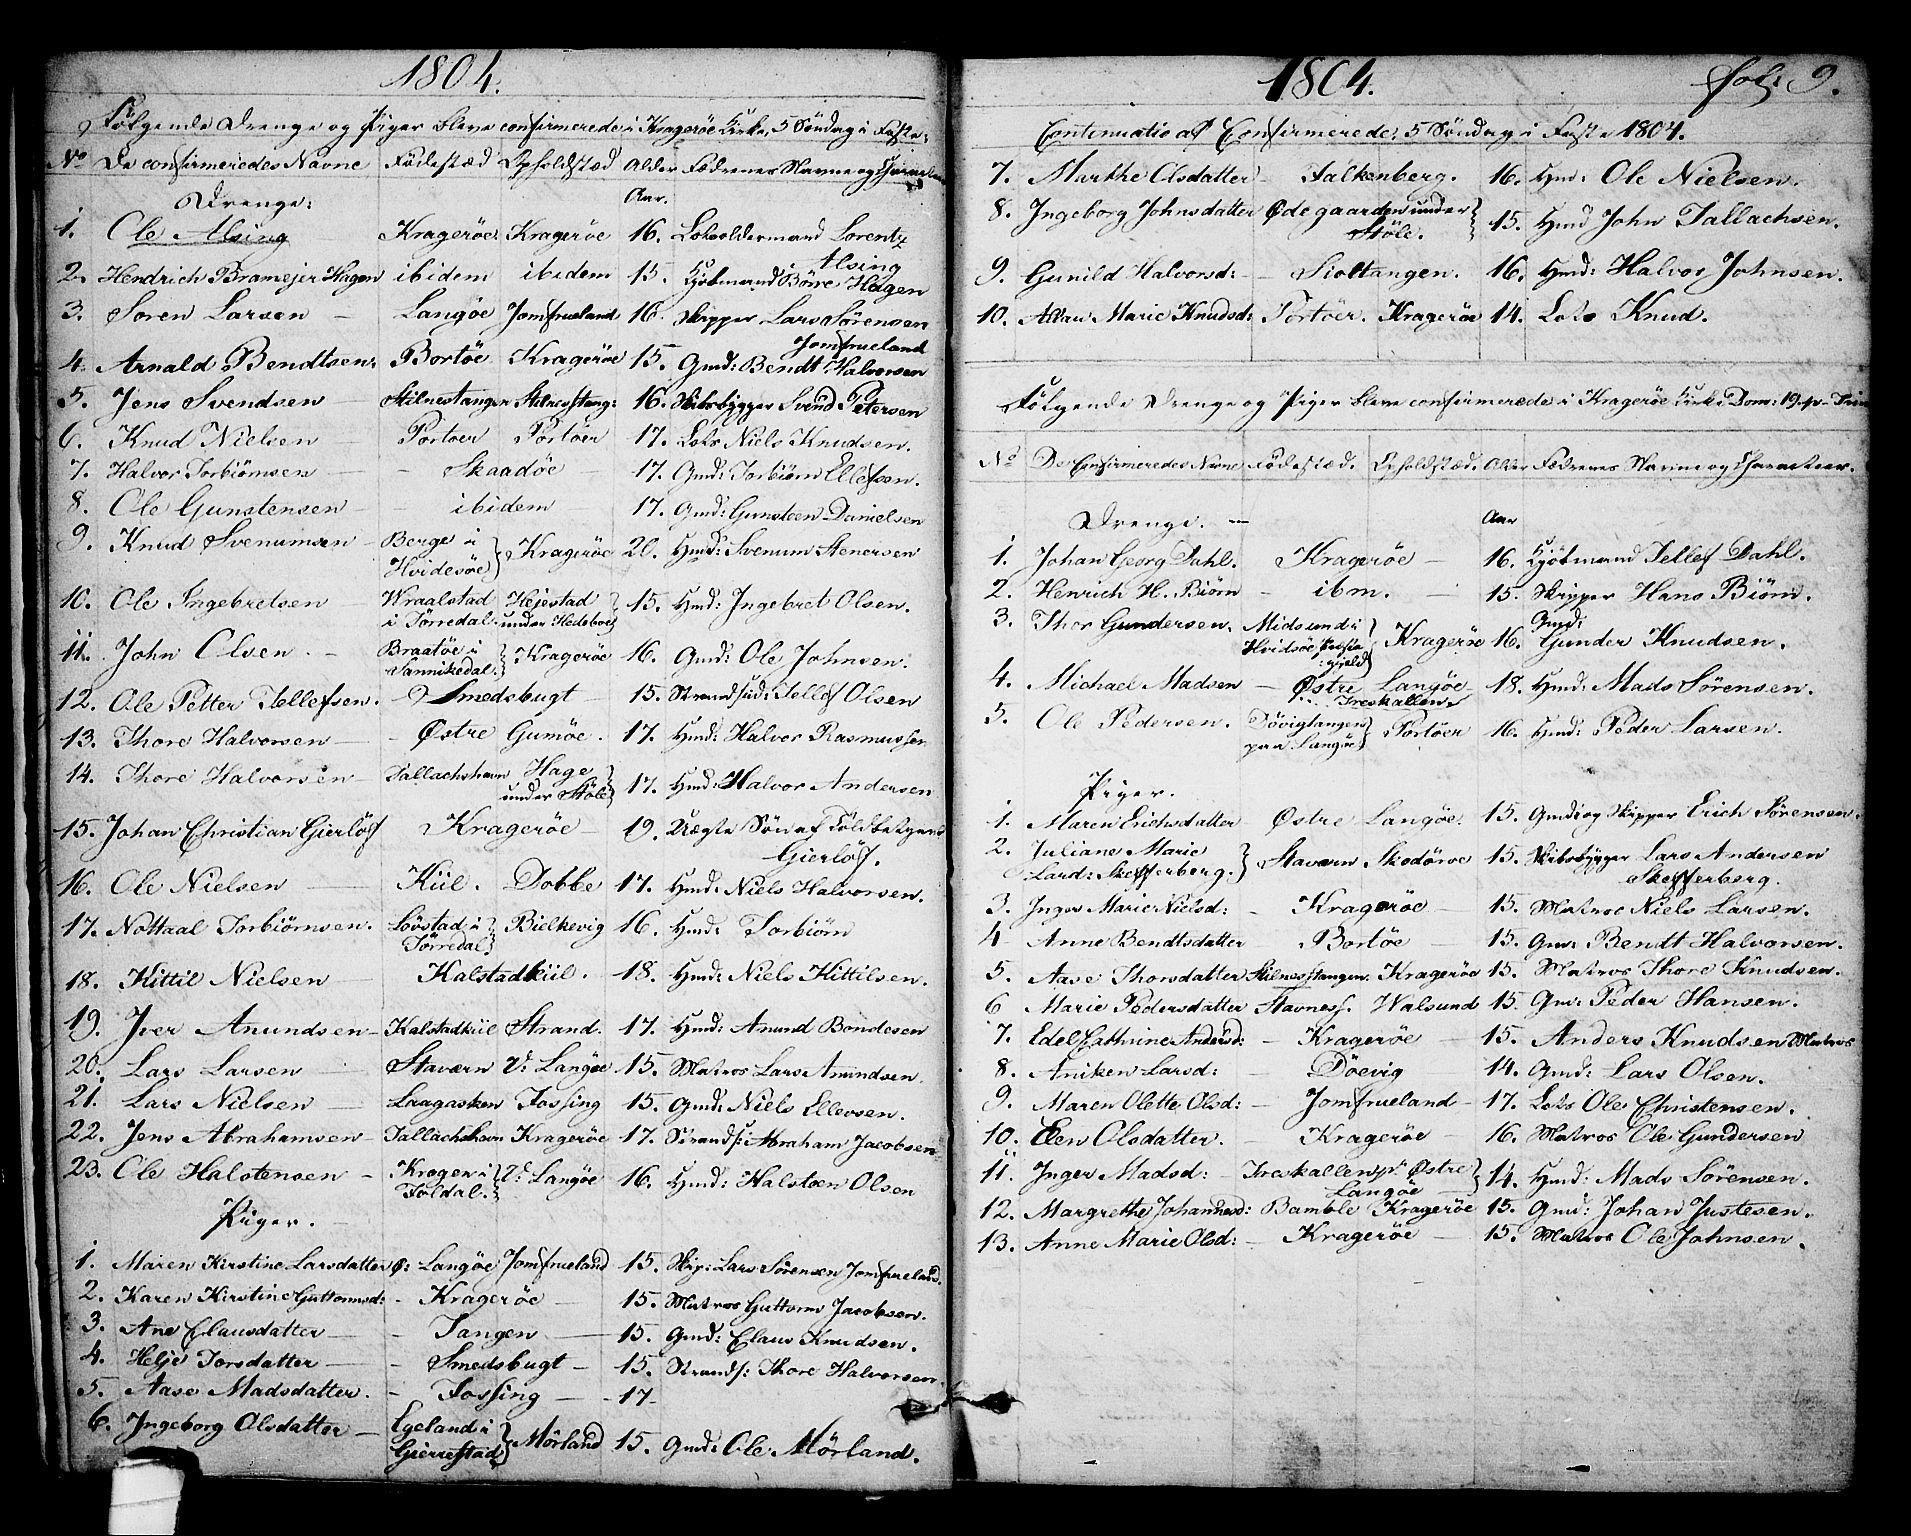 SAKO, Kragerø kirkebøker, F/Fa/L0003: Ministerialbok nr. 3, 1802-1813, s. 9